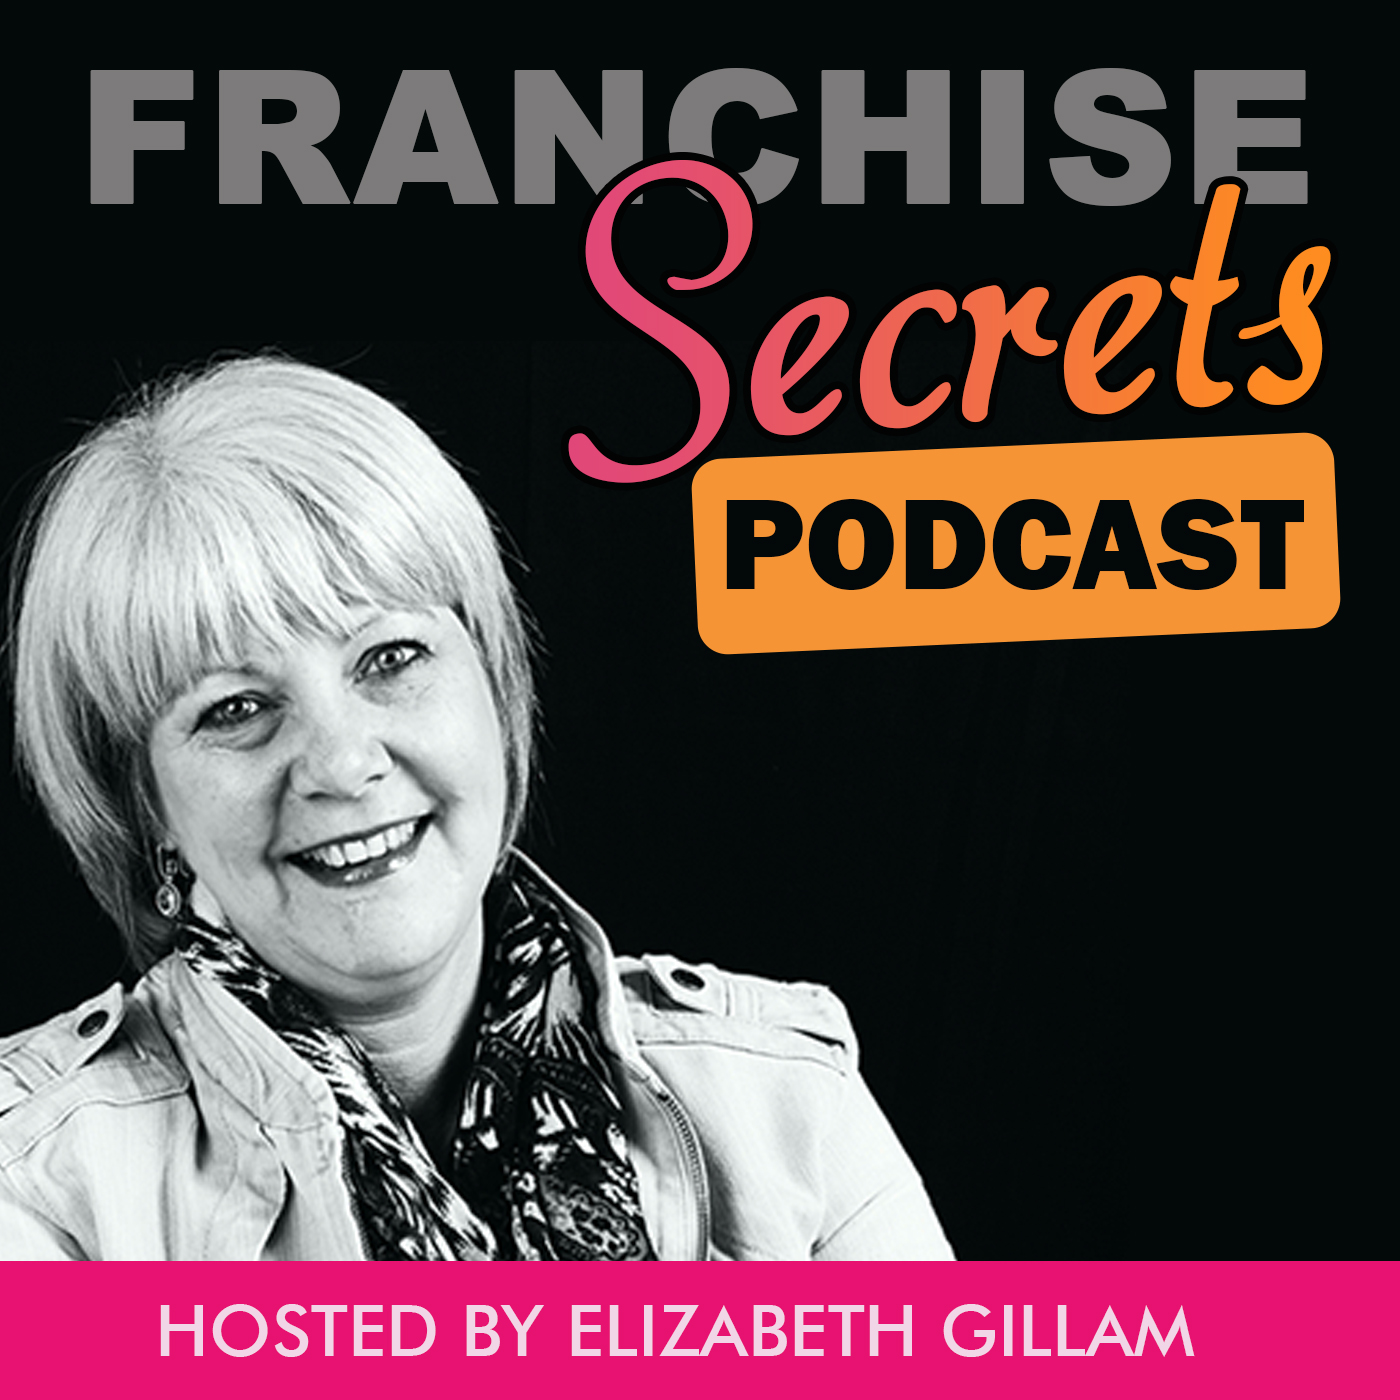 Franchise Secrets Podcast